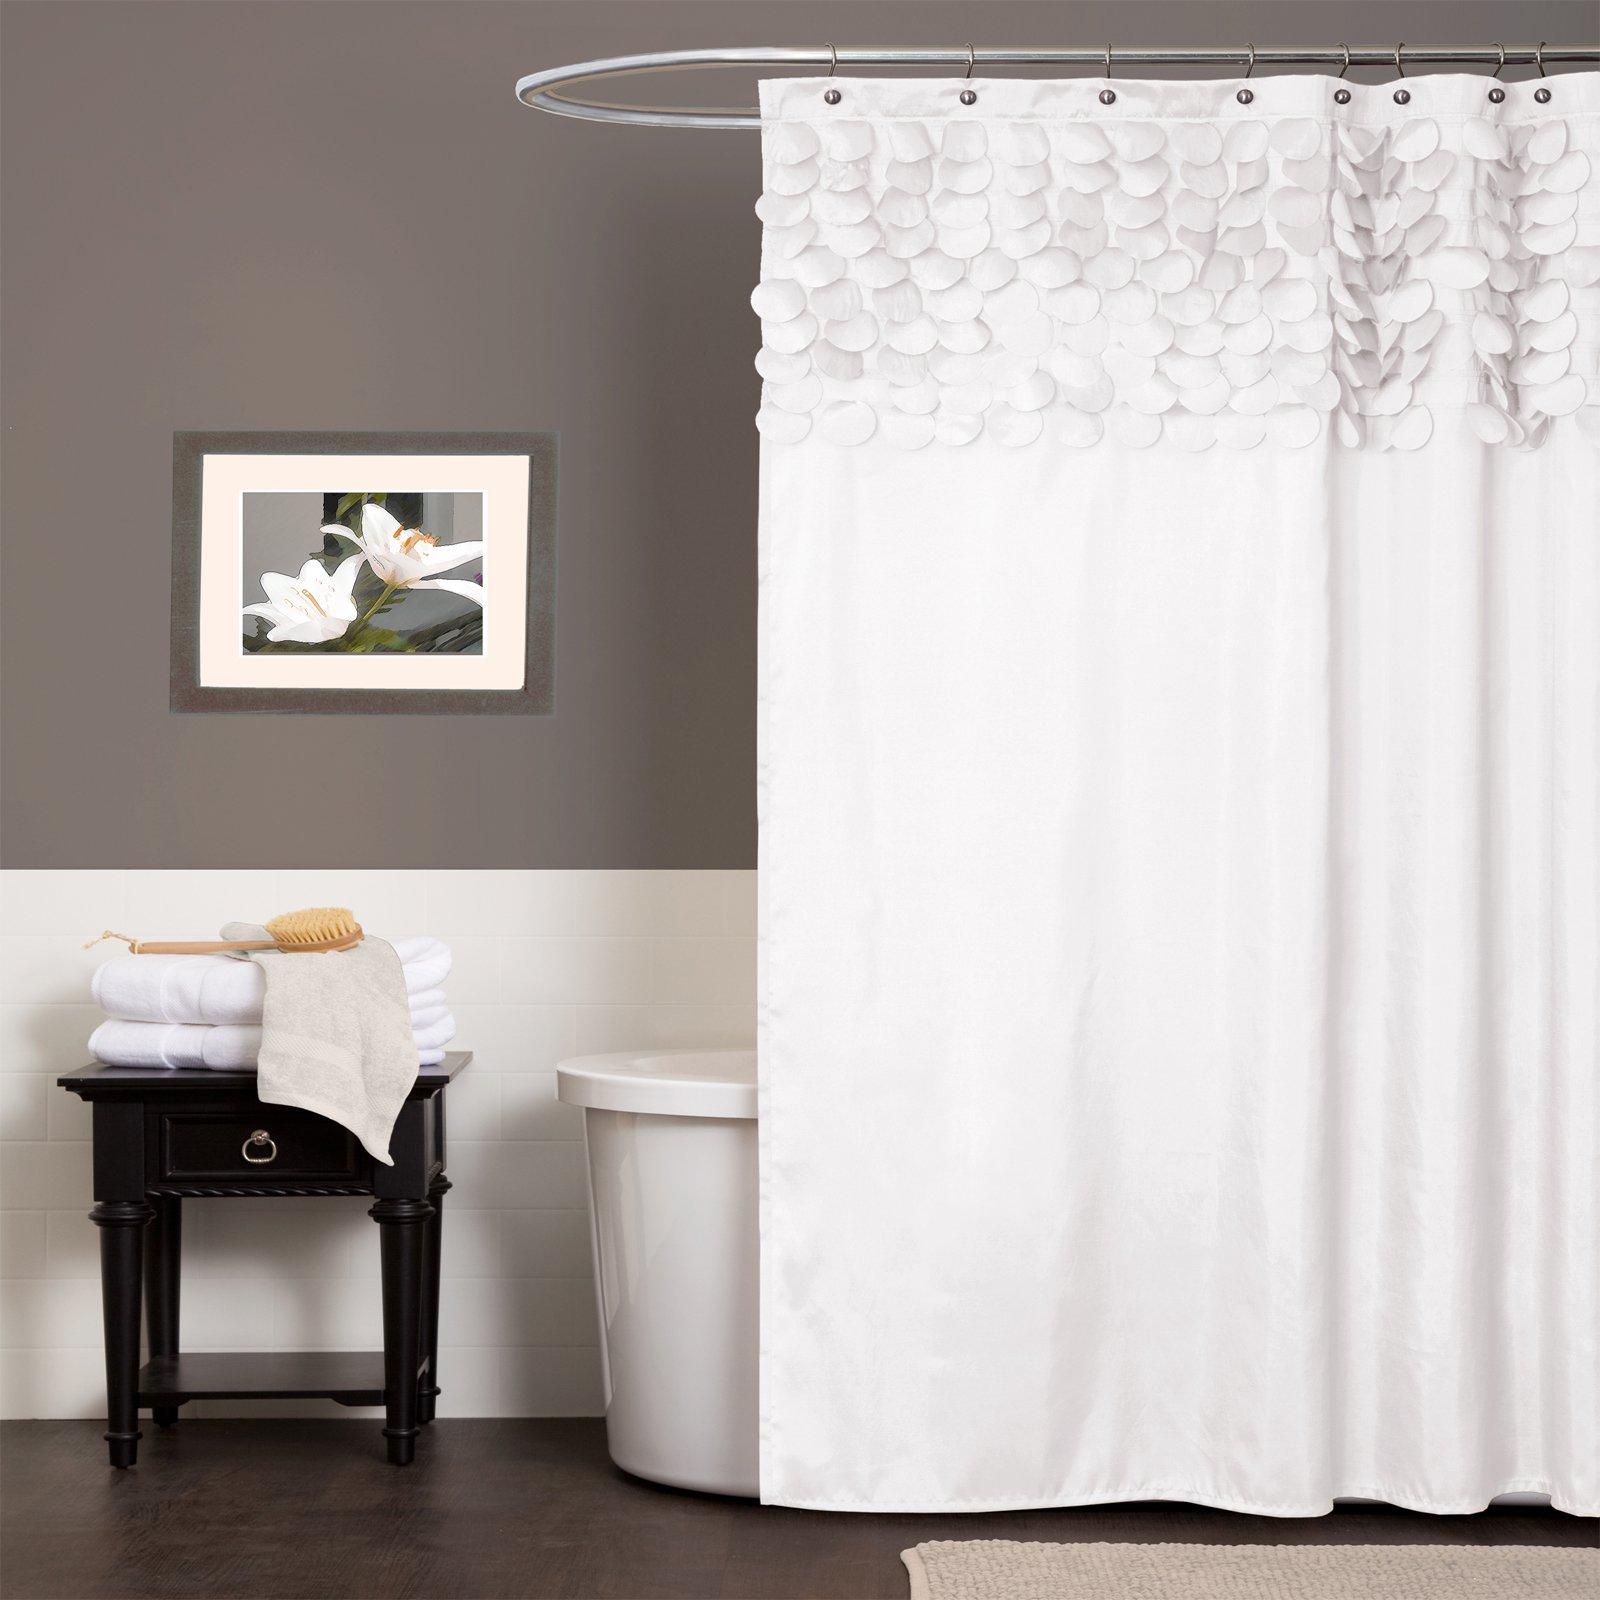 Lush Decor Lillian Shower Curtain, 72 by 72-Inch, White